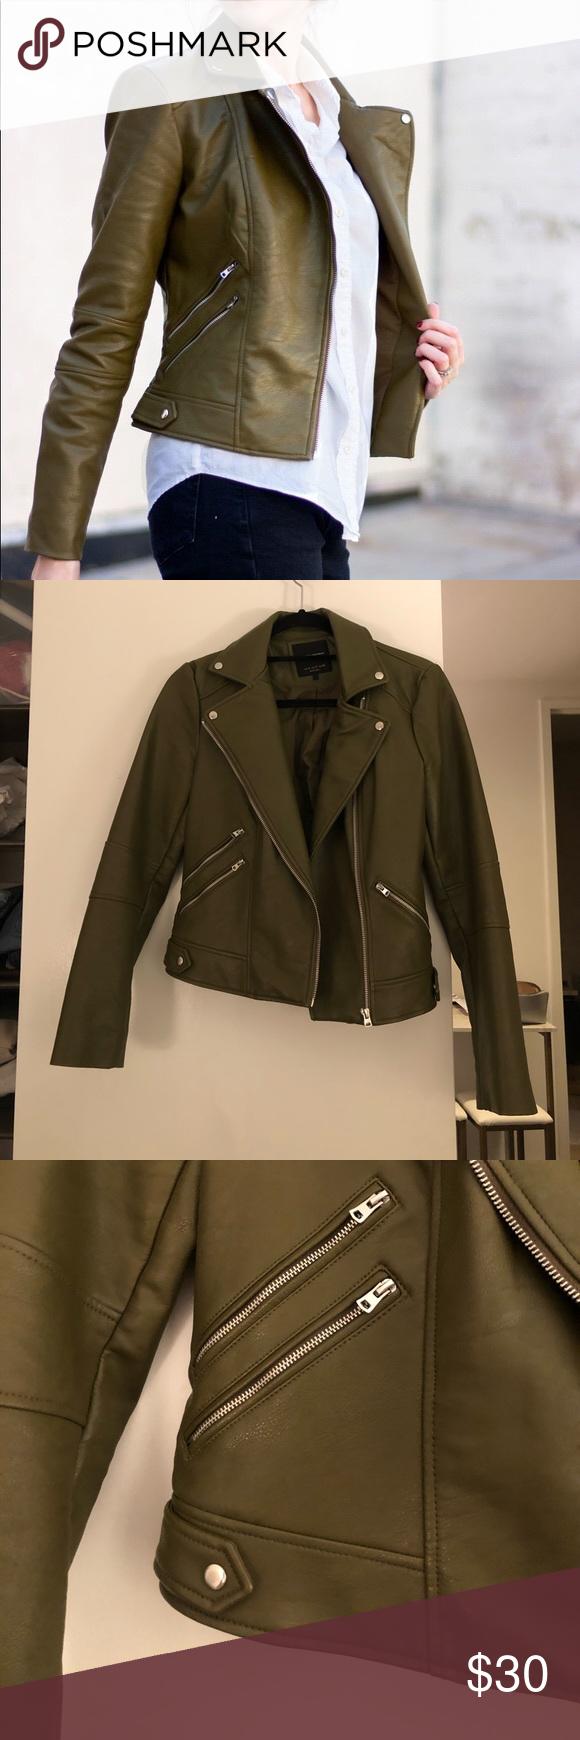 Olive Green Zara Faux Leather Jacket Faux Leather Jackets Leather Jacket Zara Leather Jacket [ 1740 x 580 Pixel ]